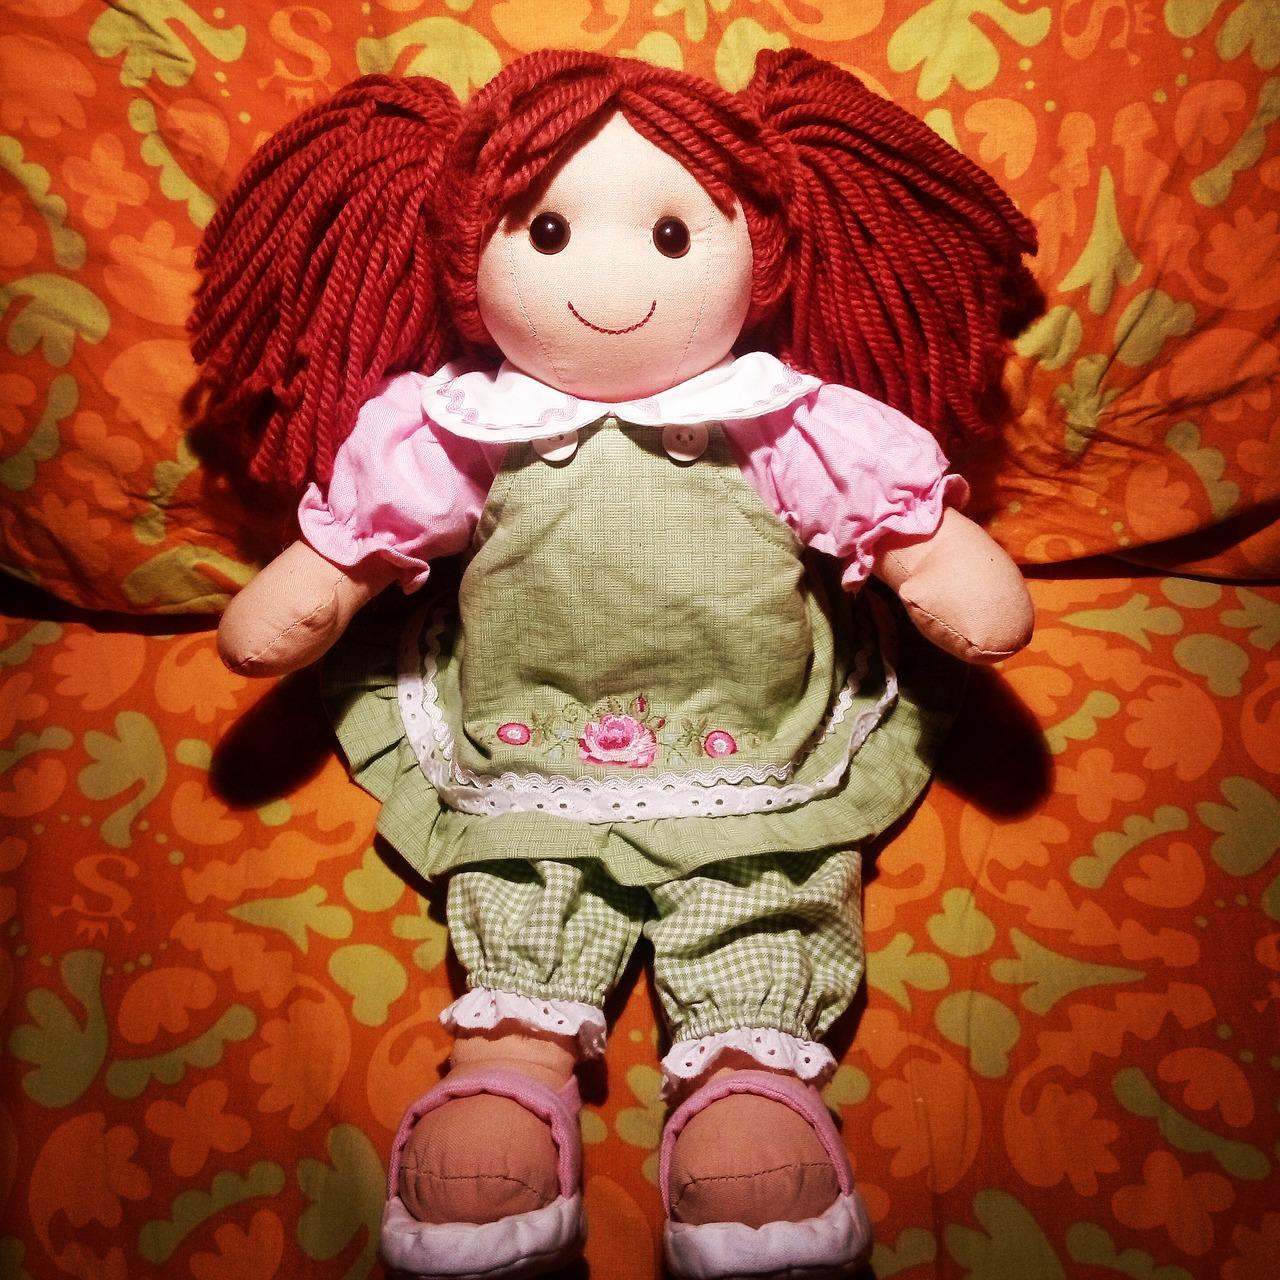 doll-1749831_1280.jpg